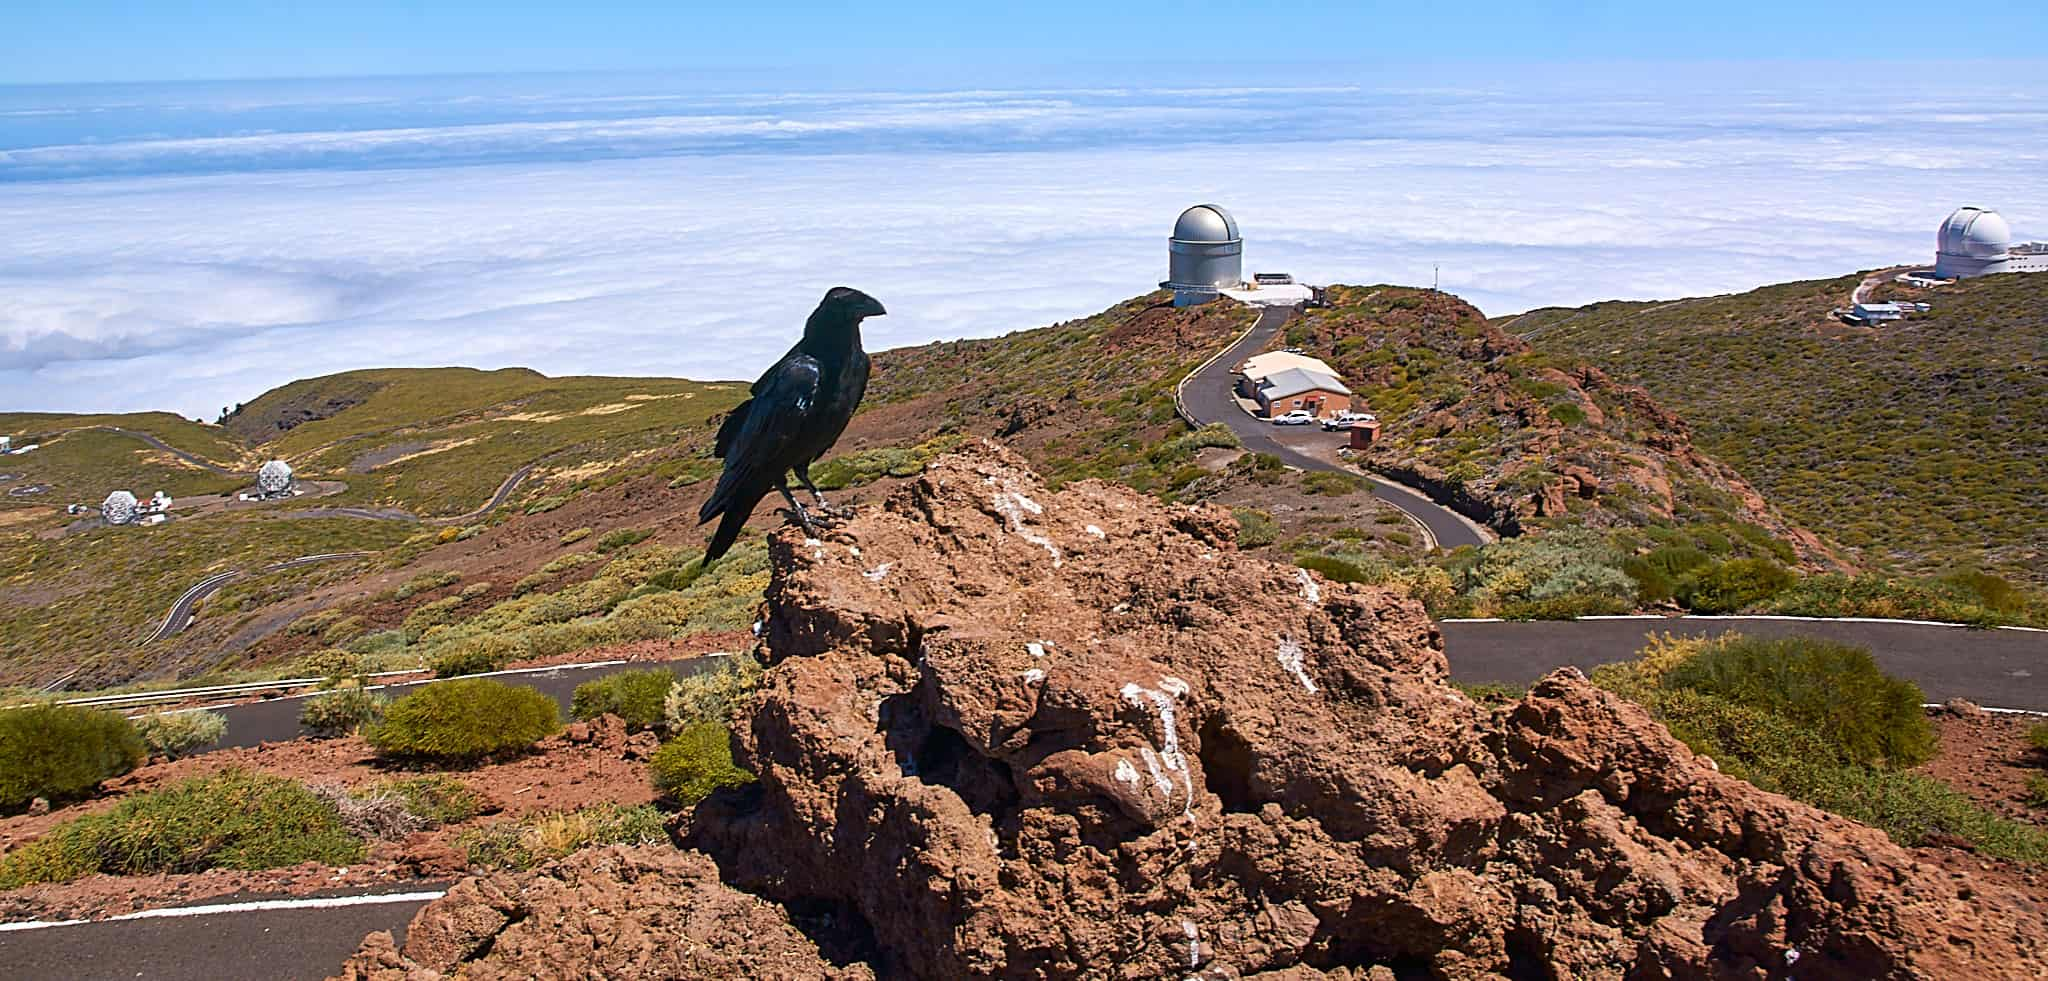 Senderismo Ruta Volcanes La Palma - Wandern - Trekking